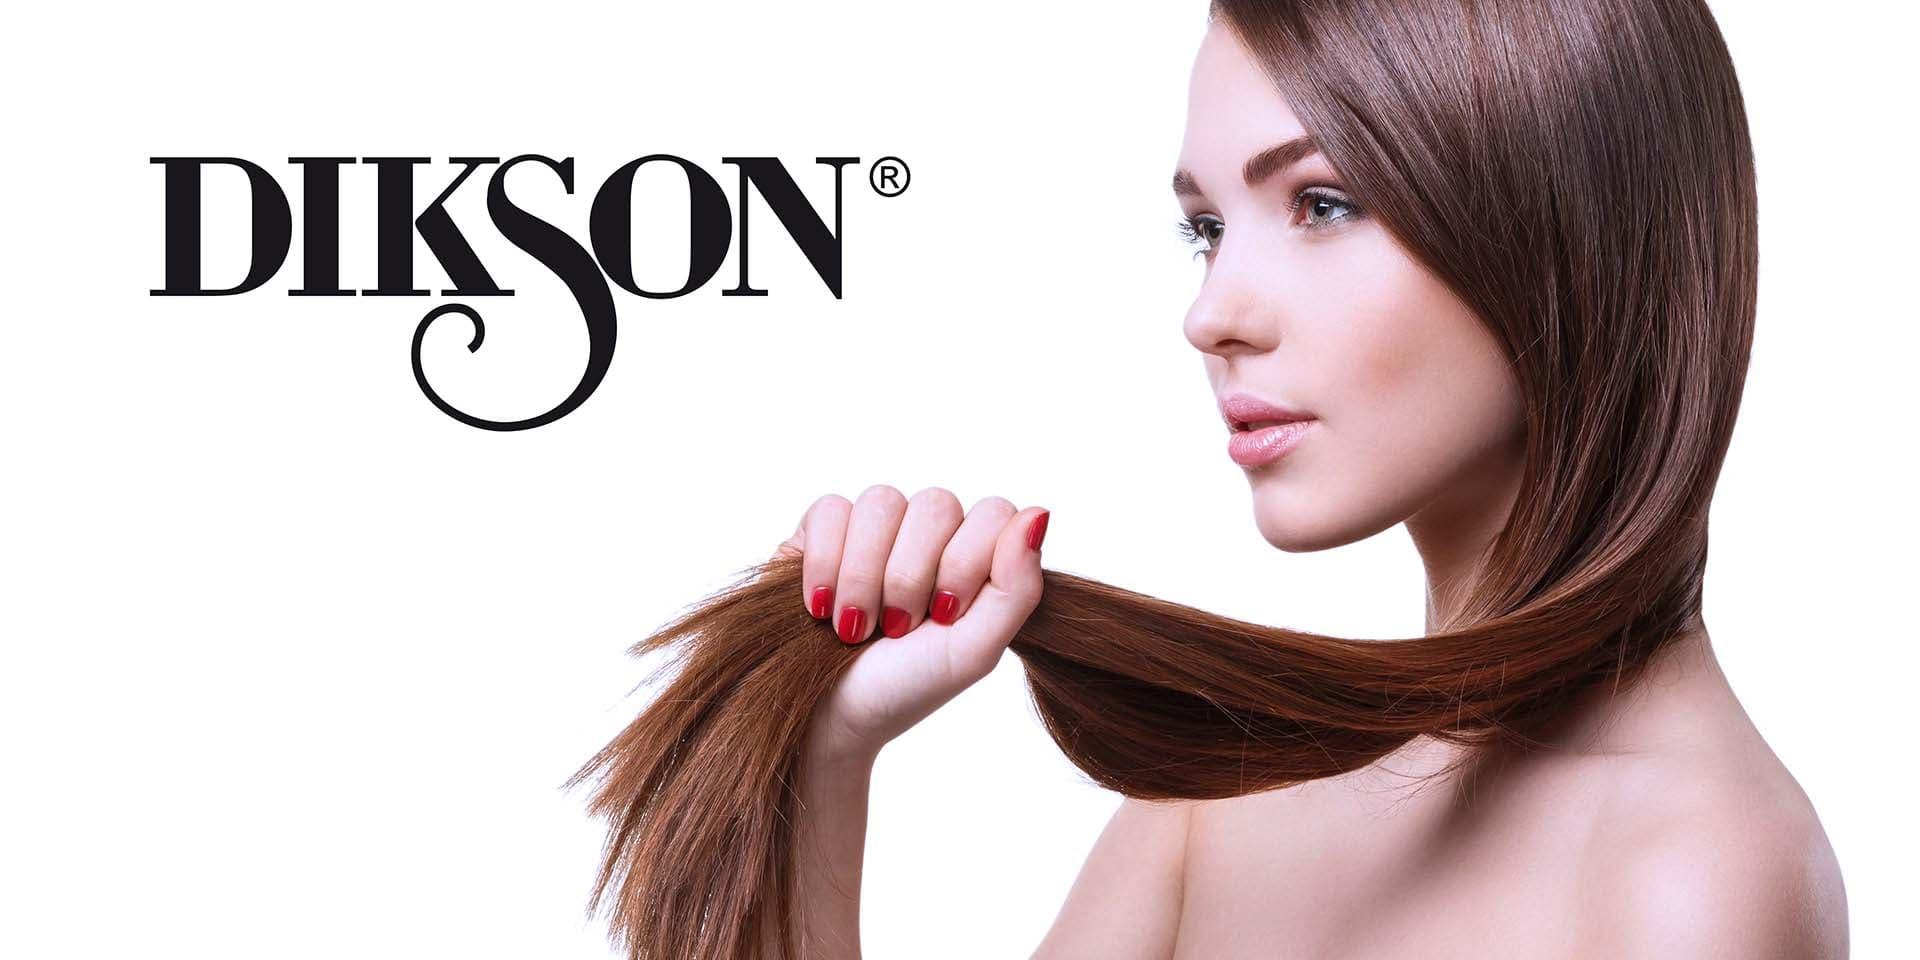 Dikson для волос, купить ампулы, шампунь, маски в Starcos.ru